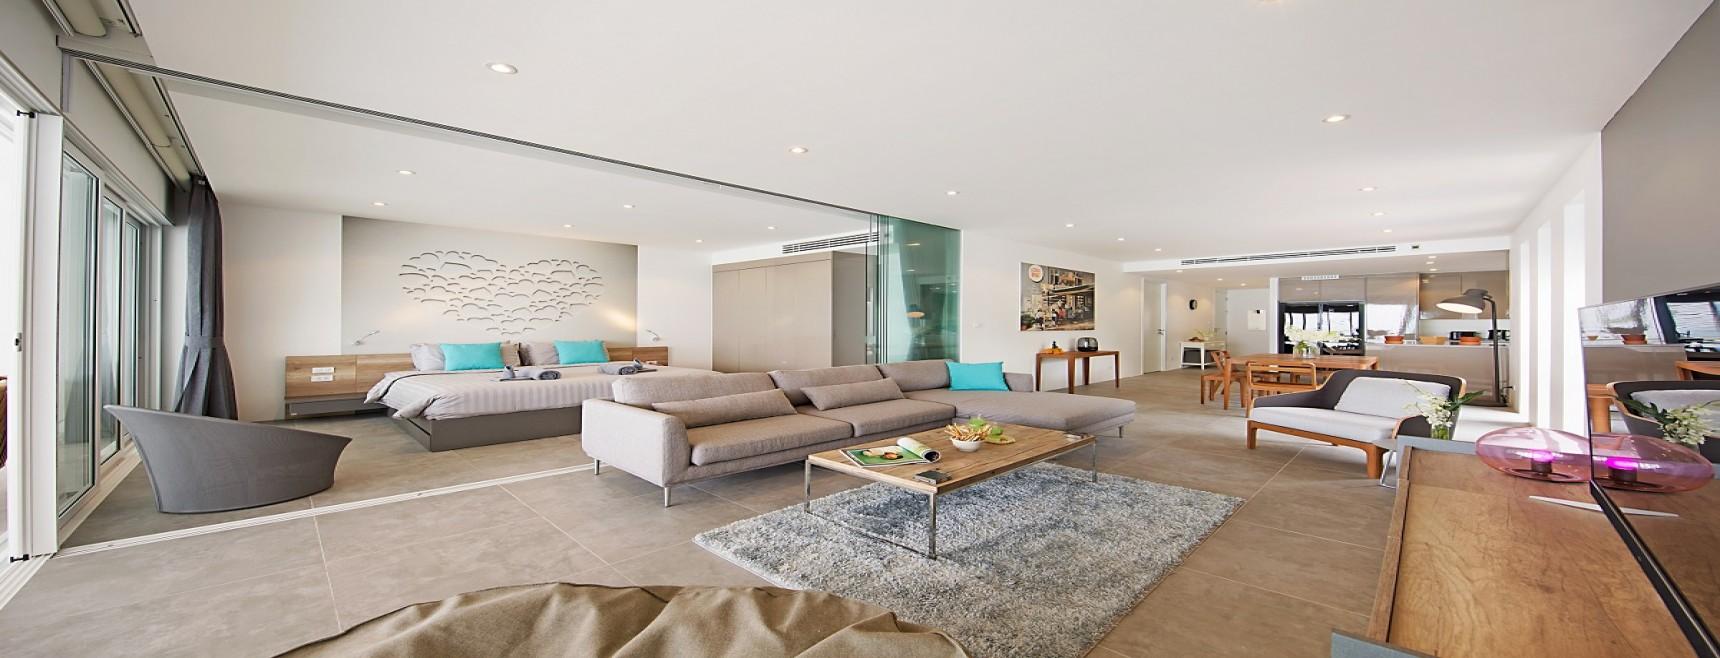 3 Bedrooms, Apartment, Residential Sales, 3 Bathrooms, Listing ID 1475, Koh Samui,